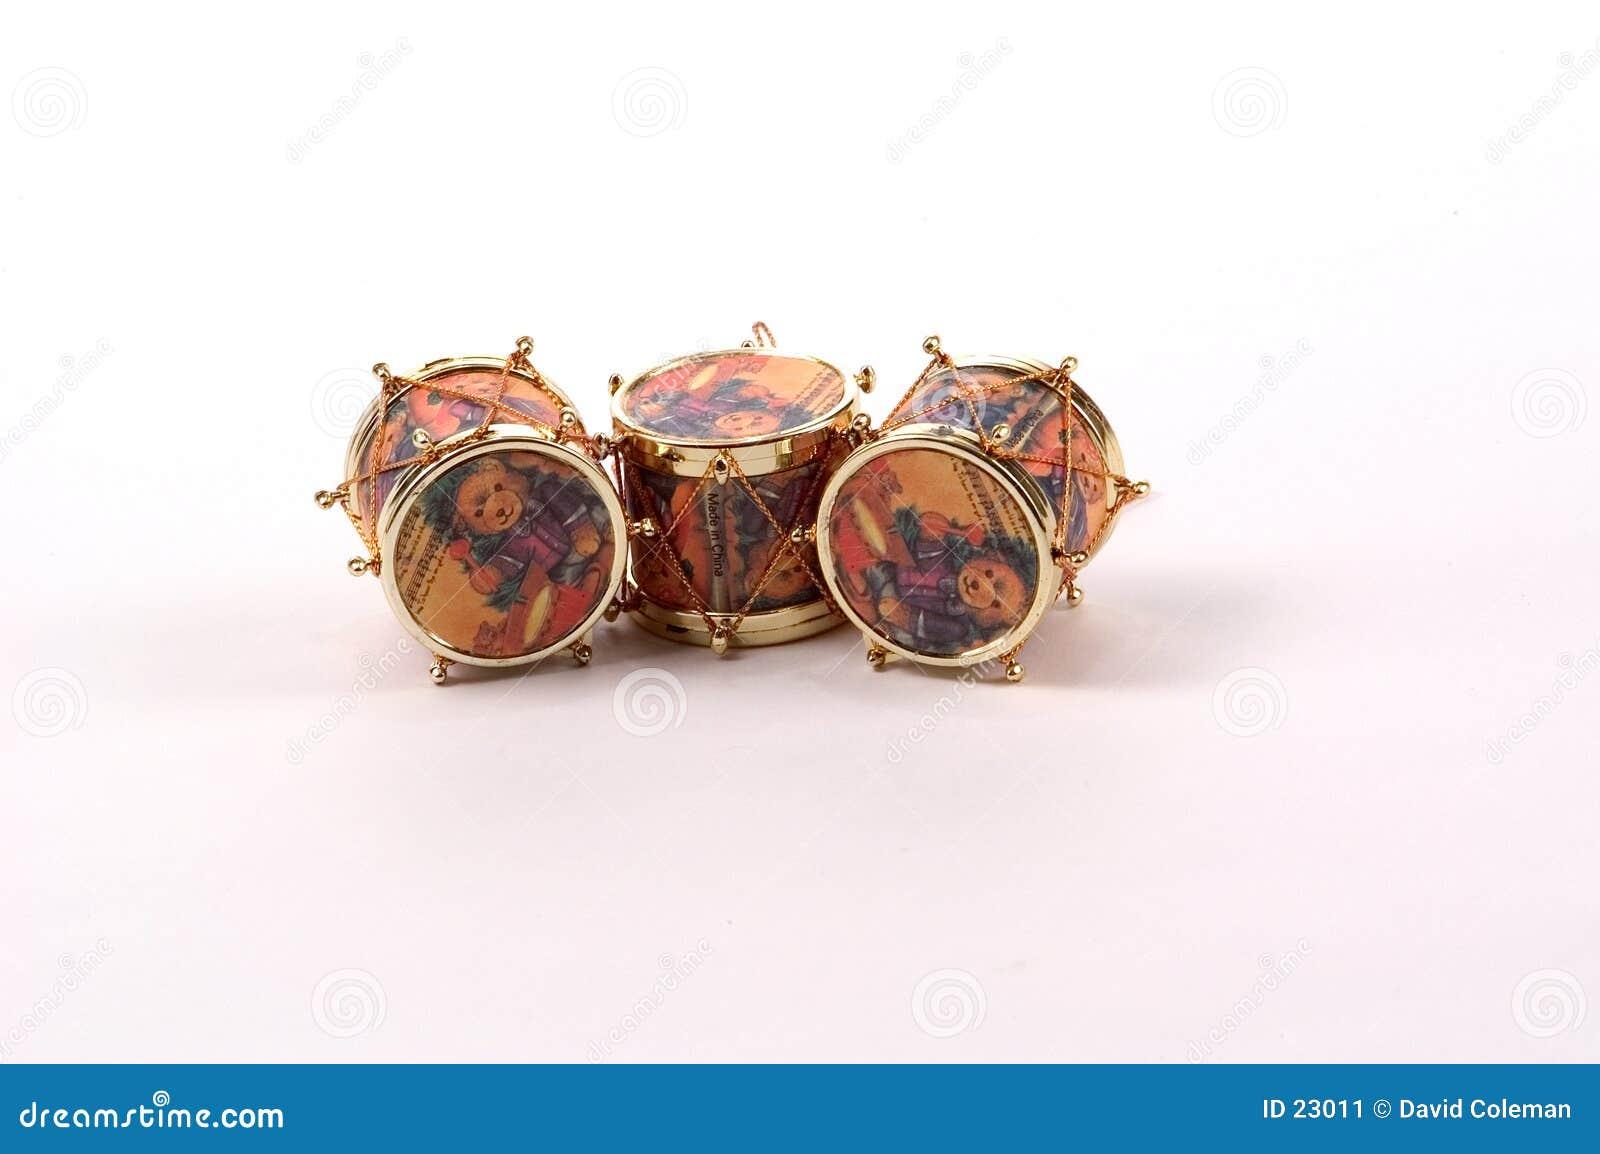 Drum Ornaments